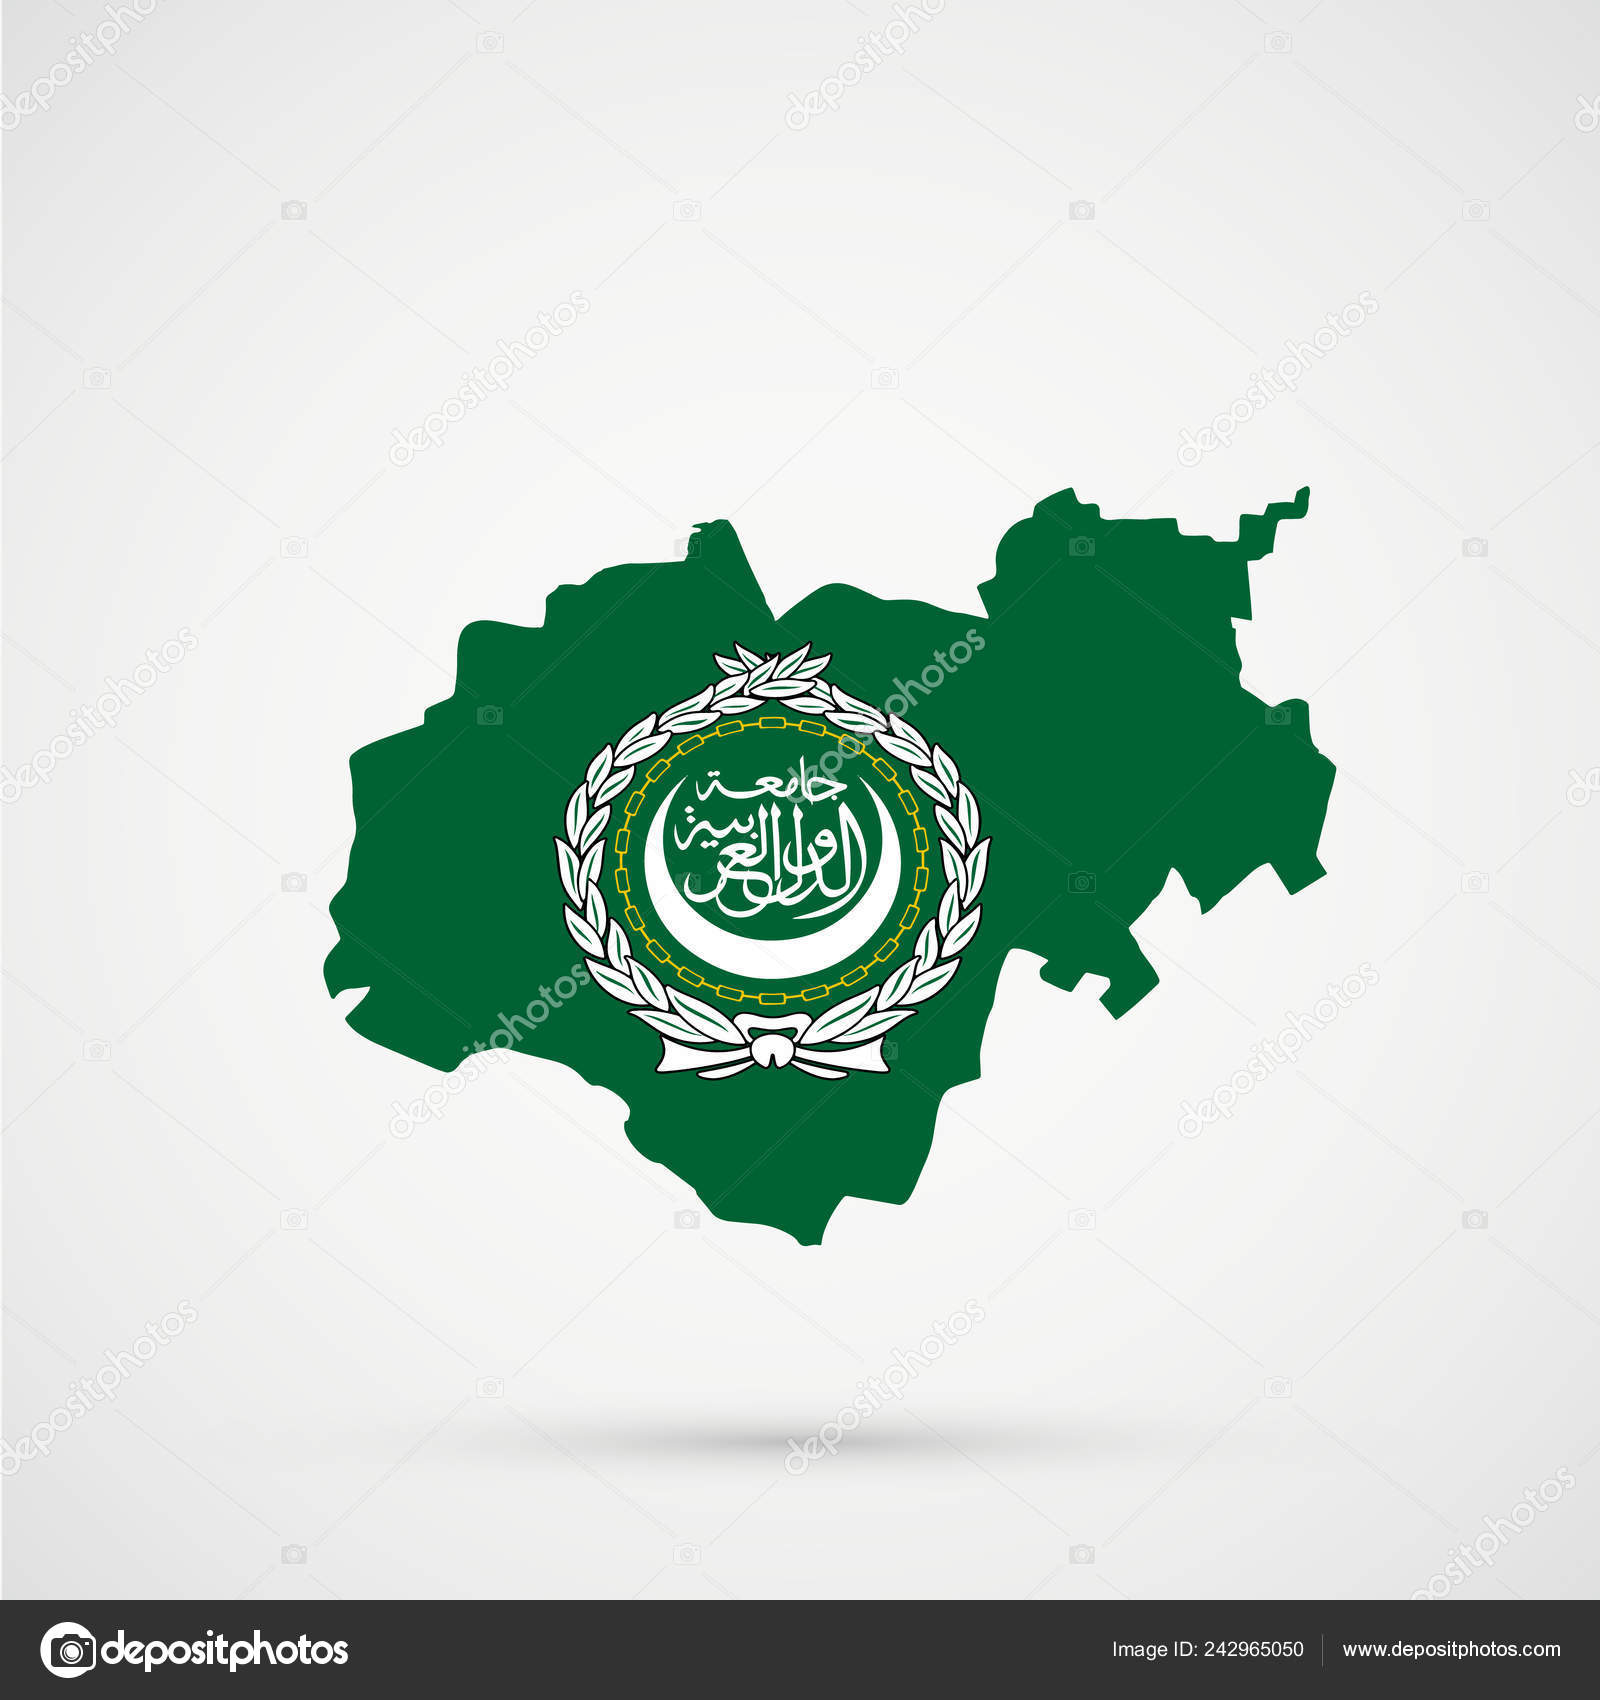 Picture of: Kabardino Balkaria Map Arab League Flag Colors Editable Vector Stock Vector C L8l 242965050